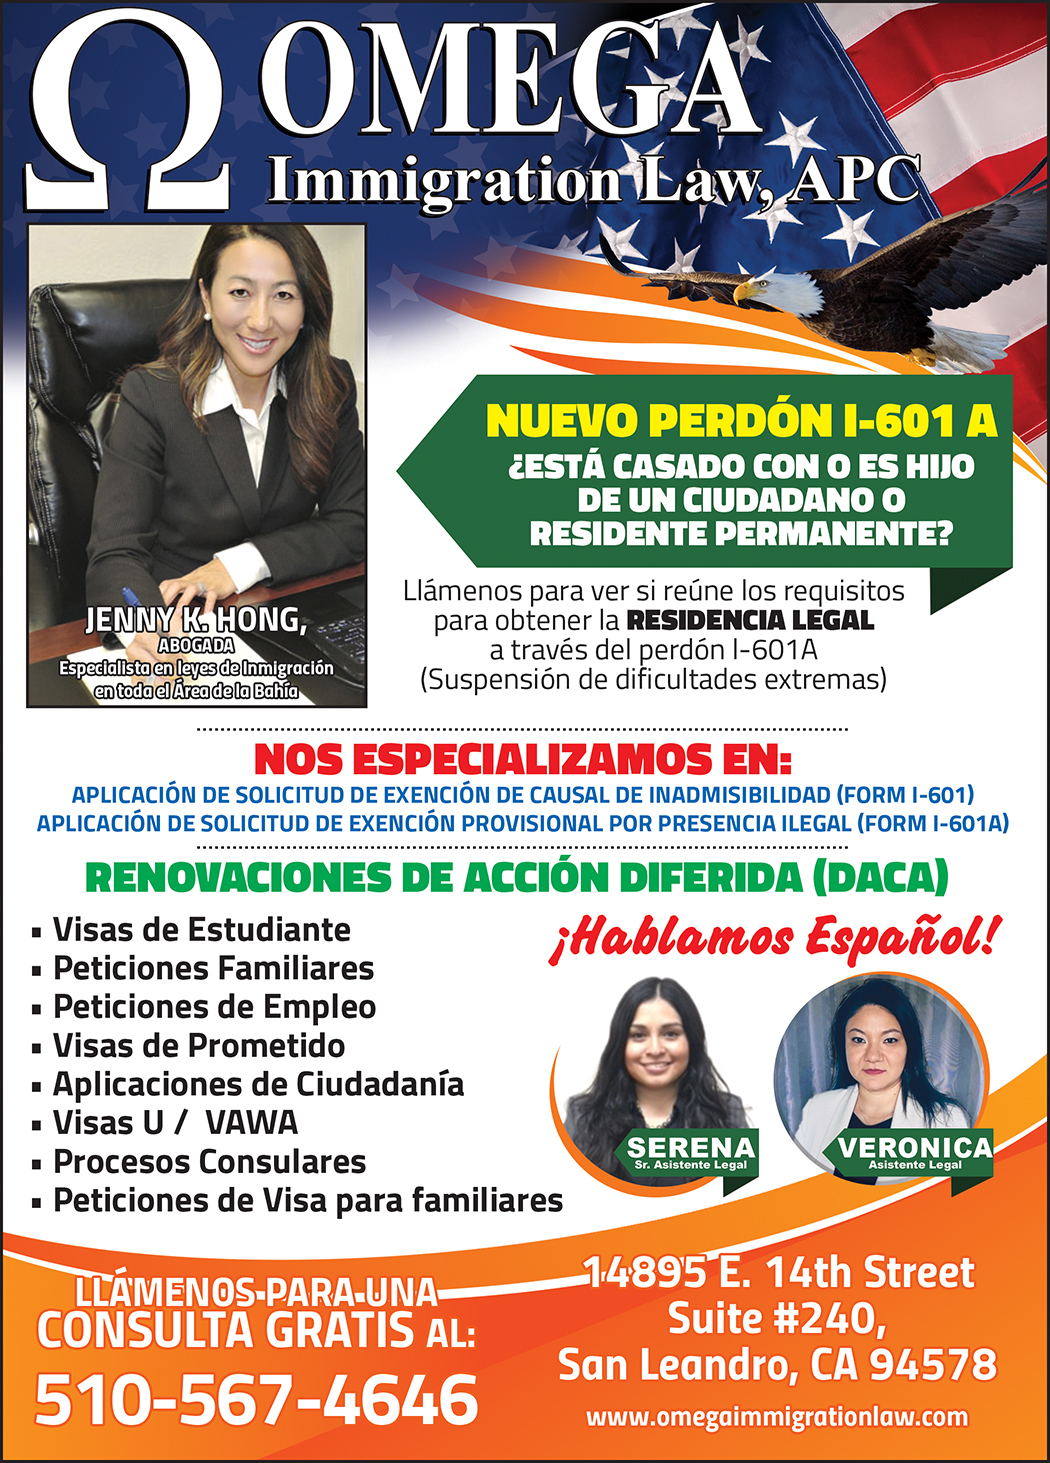 Omega Immigration Law APC 1 pag JUNIO 2019 copy.jpg